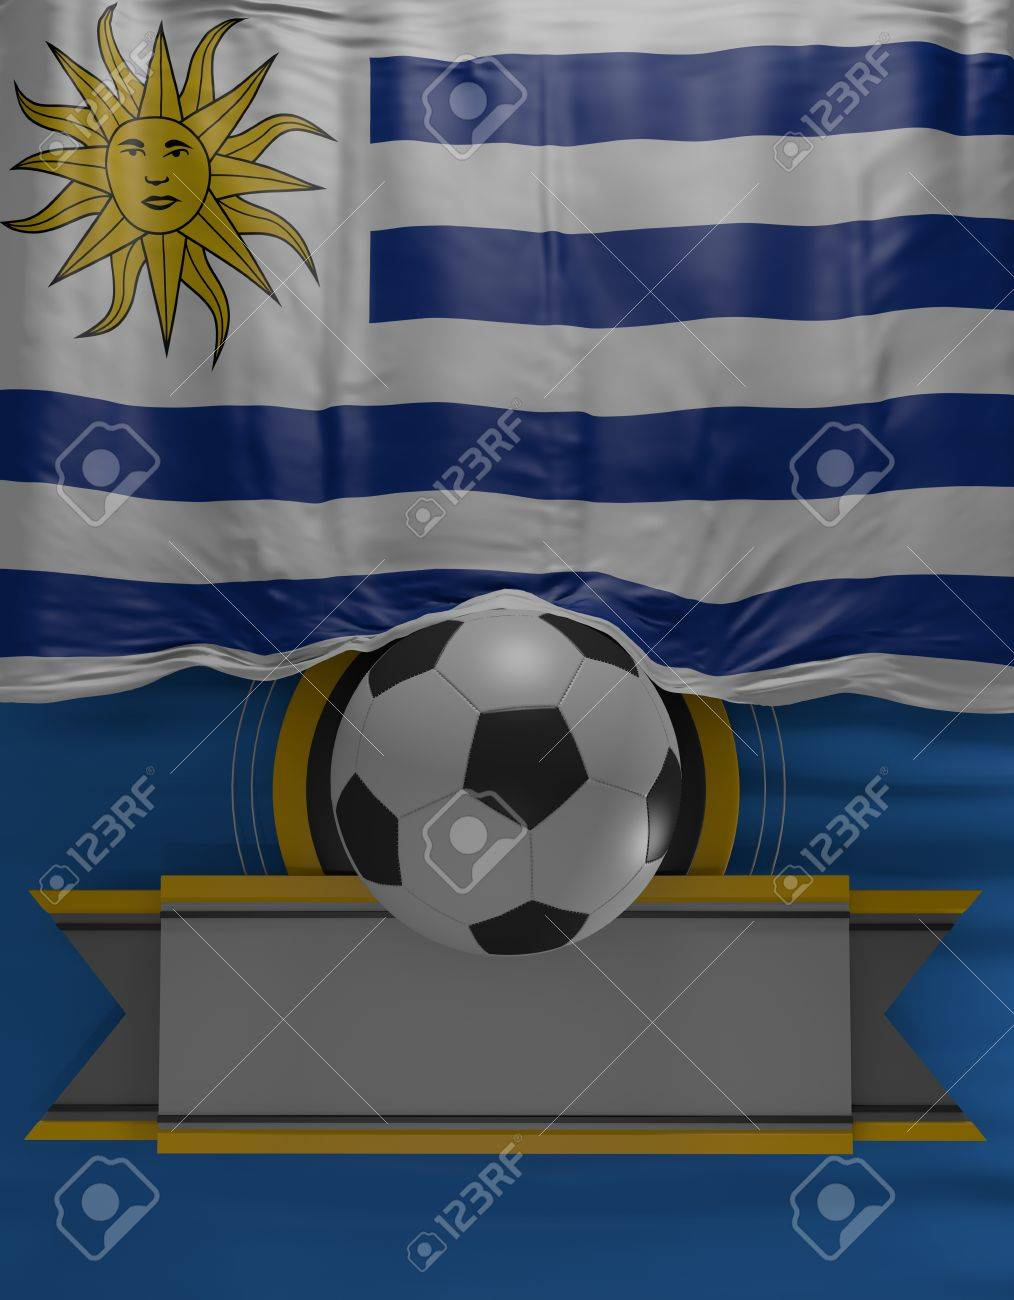 Fußball, Fußball, Flagge Uruguayische Farben, Uruguay Flagge (3D ...